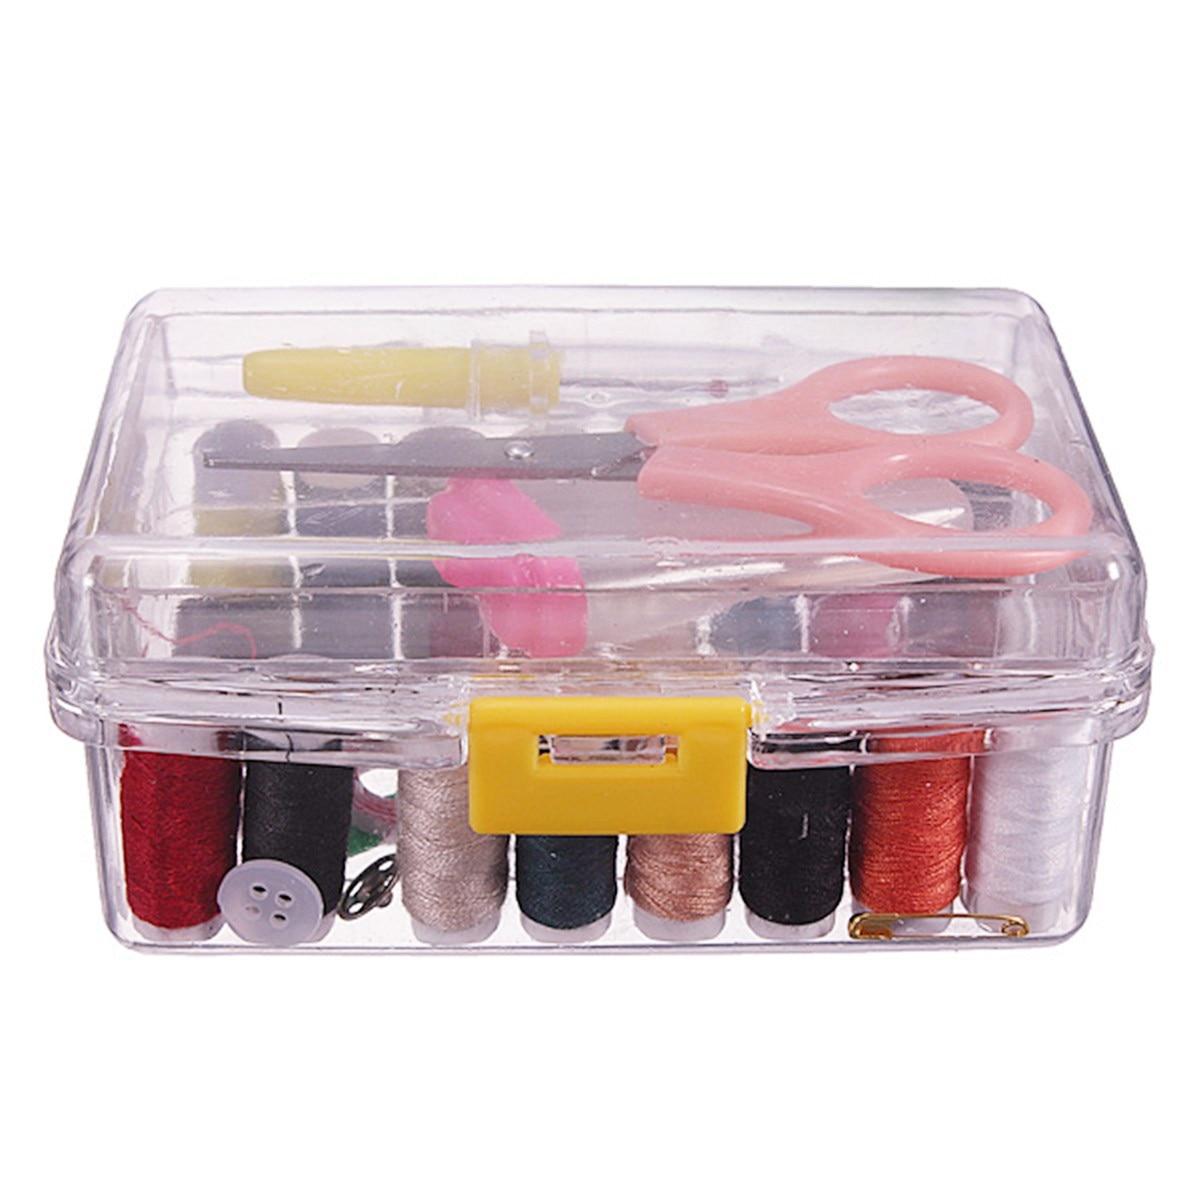 Sewing Storage Boxes Plastic Listitdallas